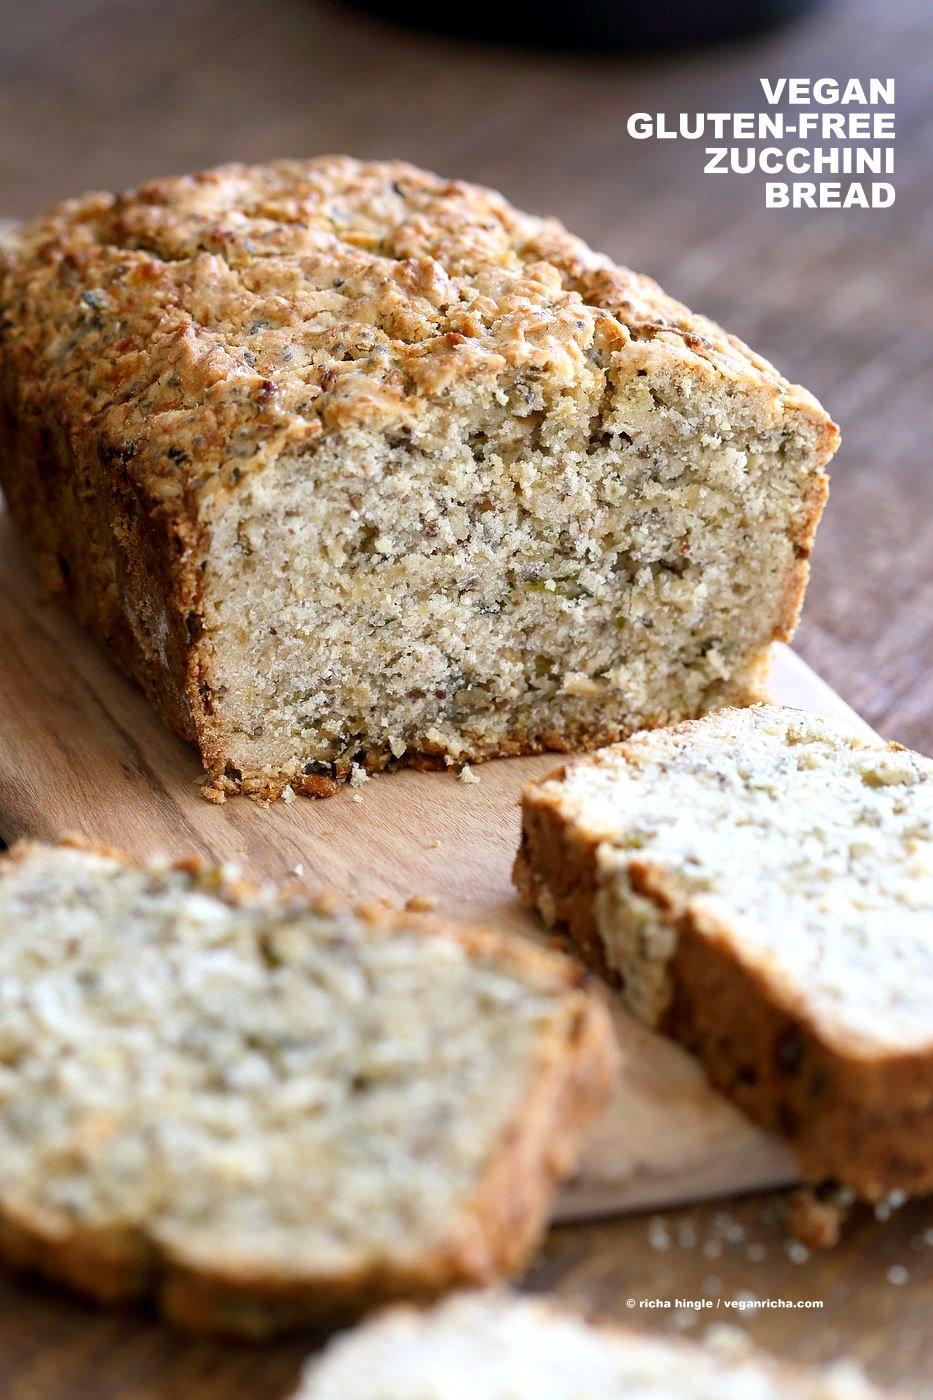 Gluten Free Bread Recipe  Vegan Gluten free Zucchini Bread Recipe Vegan Richa